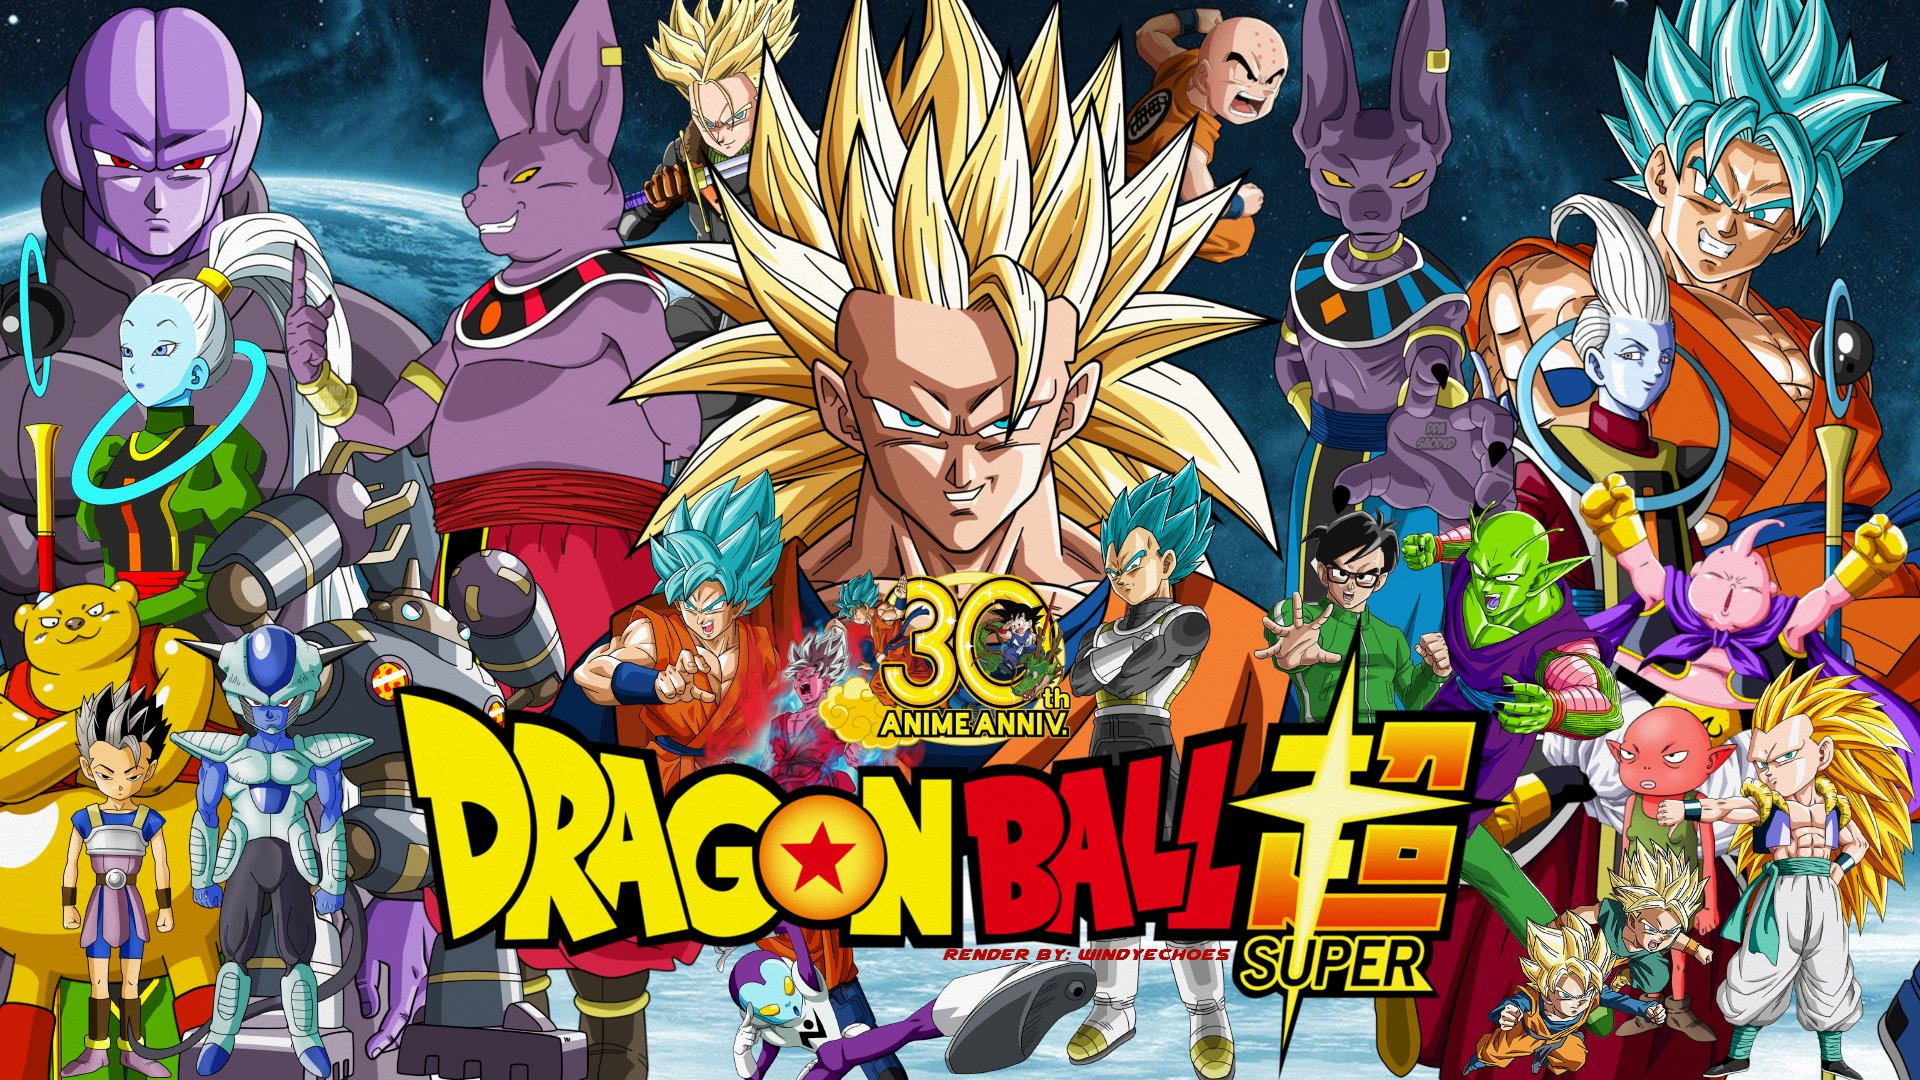 Dragon Ball Super Wallpaper Hd 1920x1080 Hd Wallpaper For